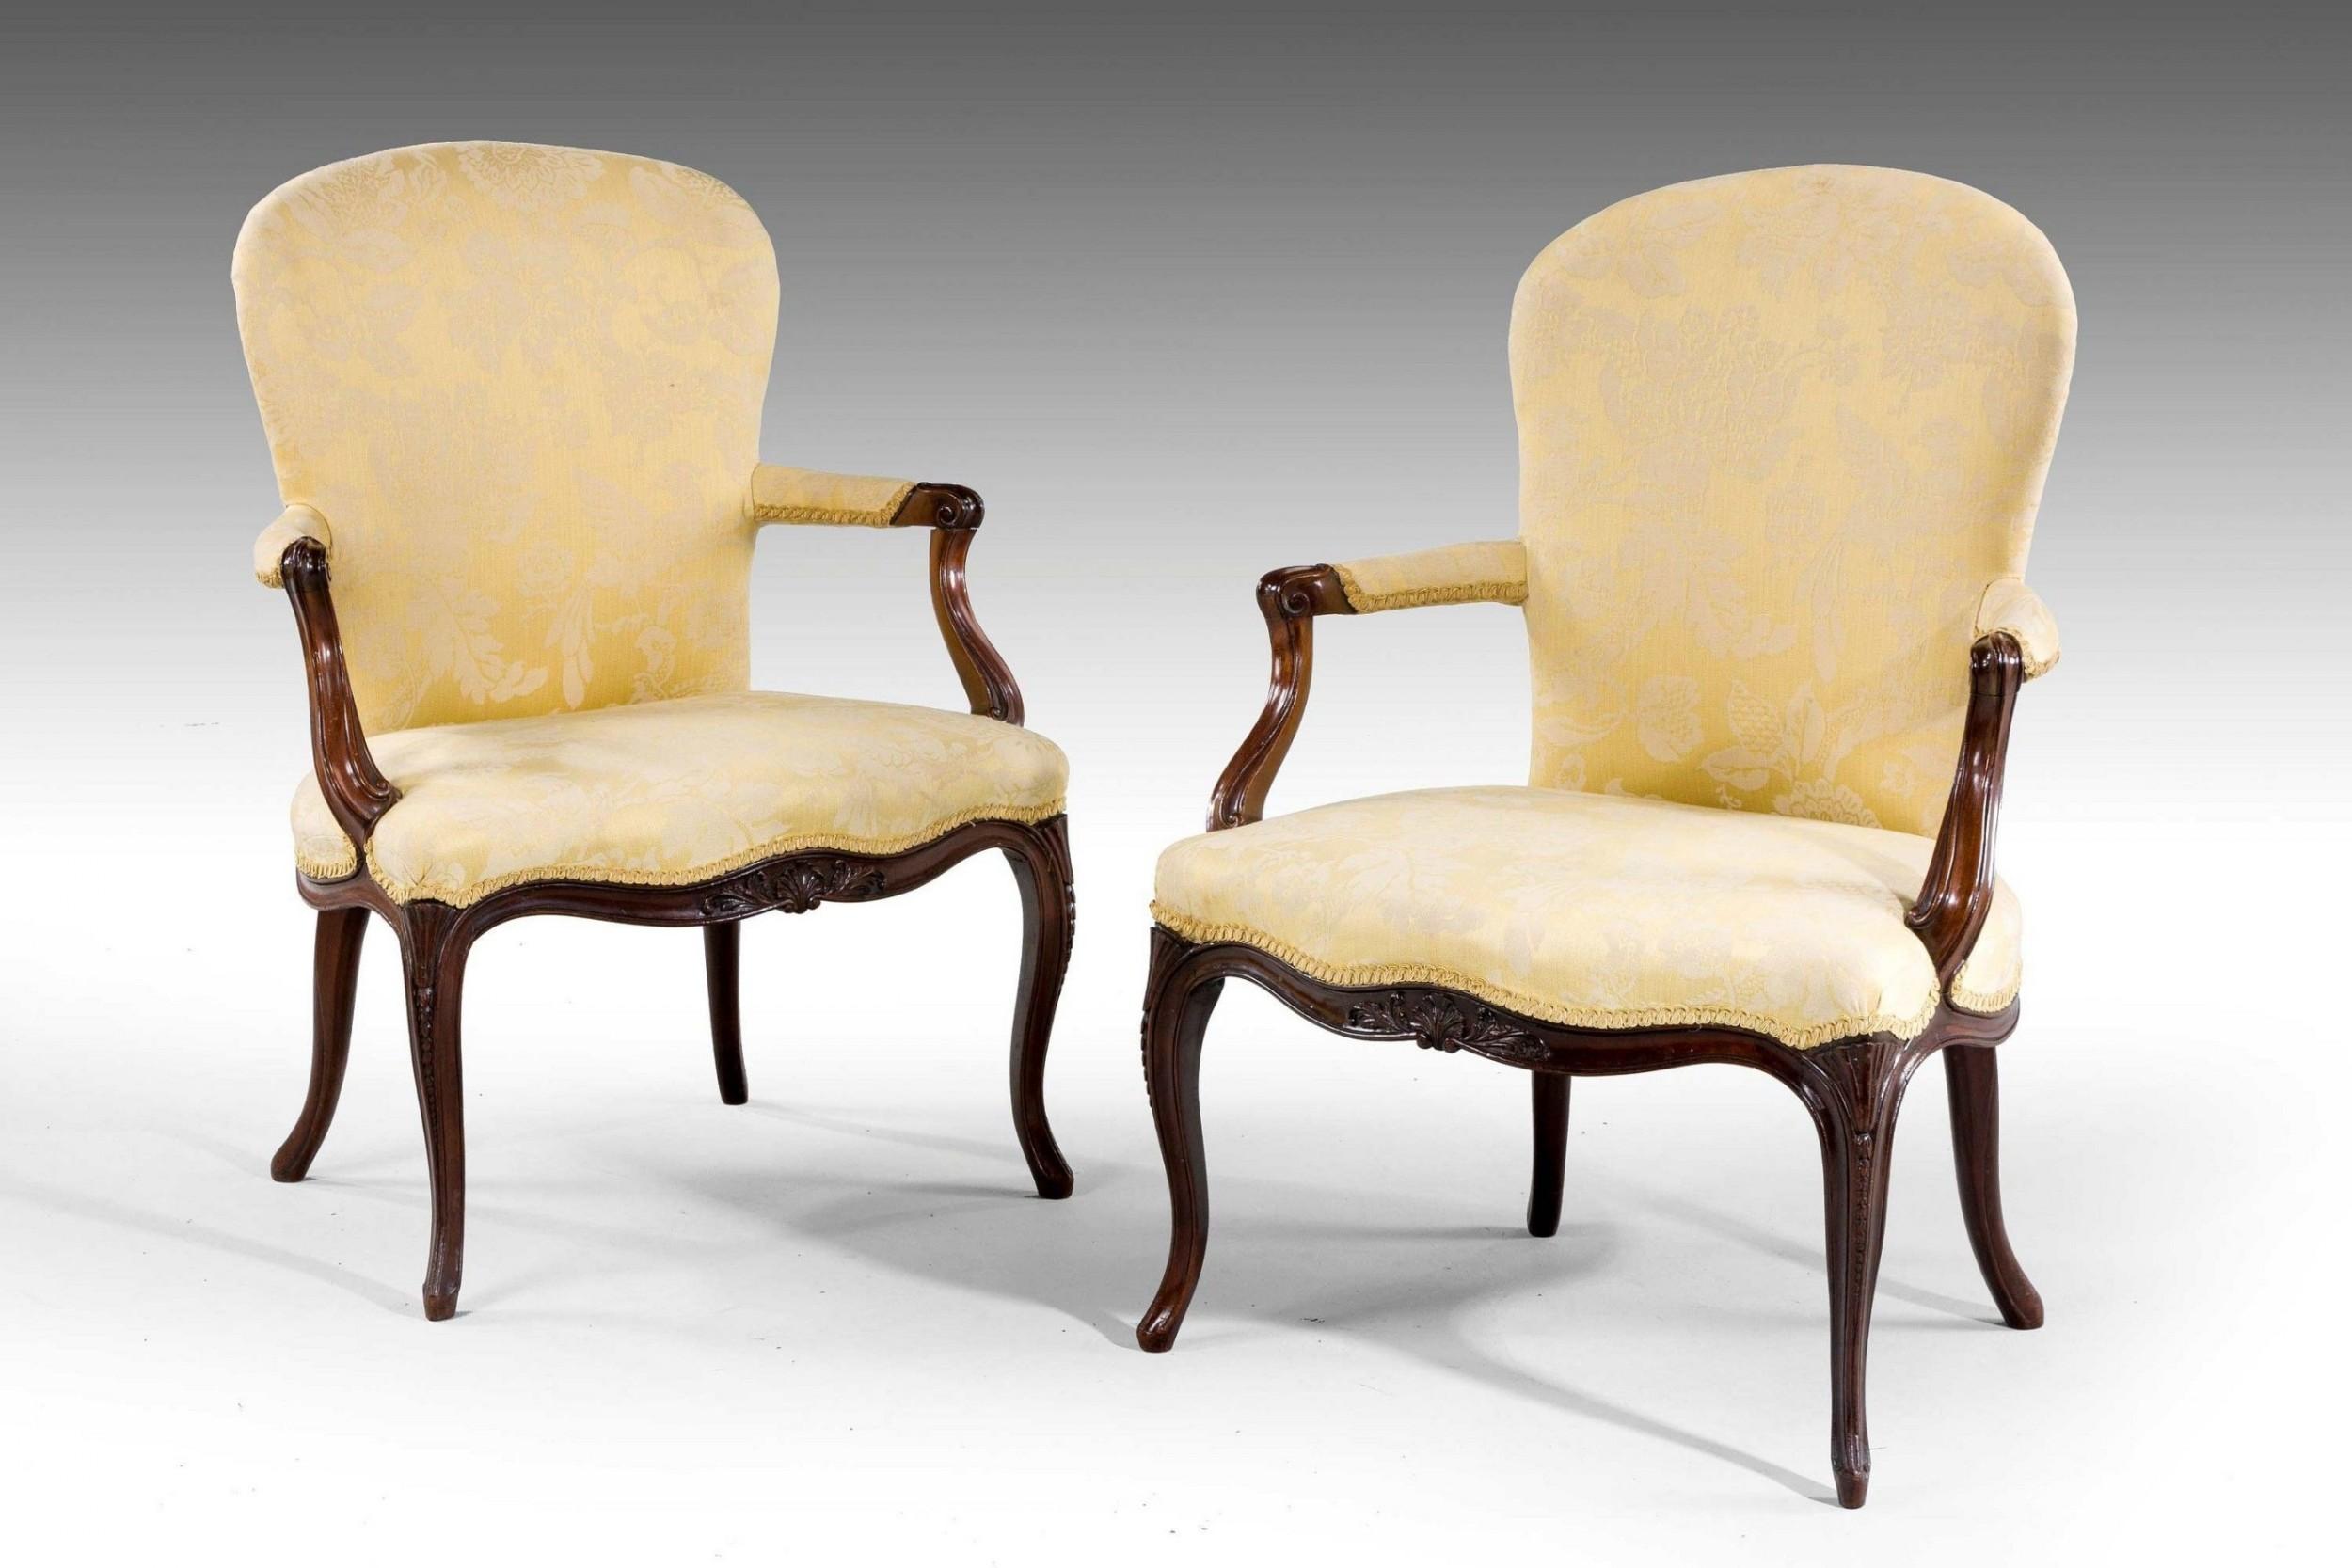 pair of george iii period armchairs